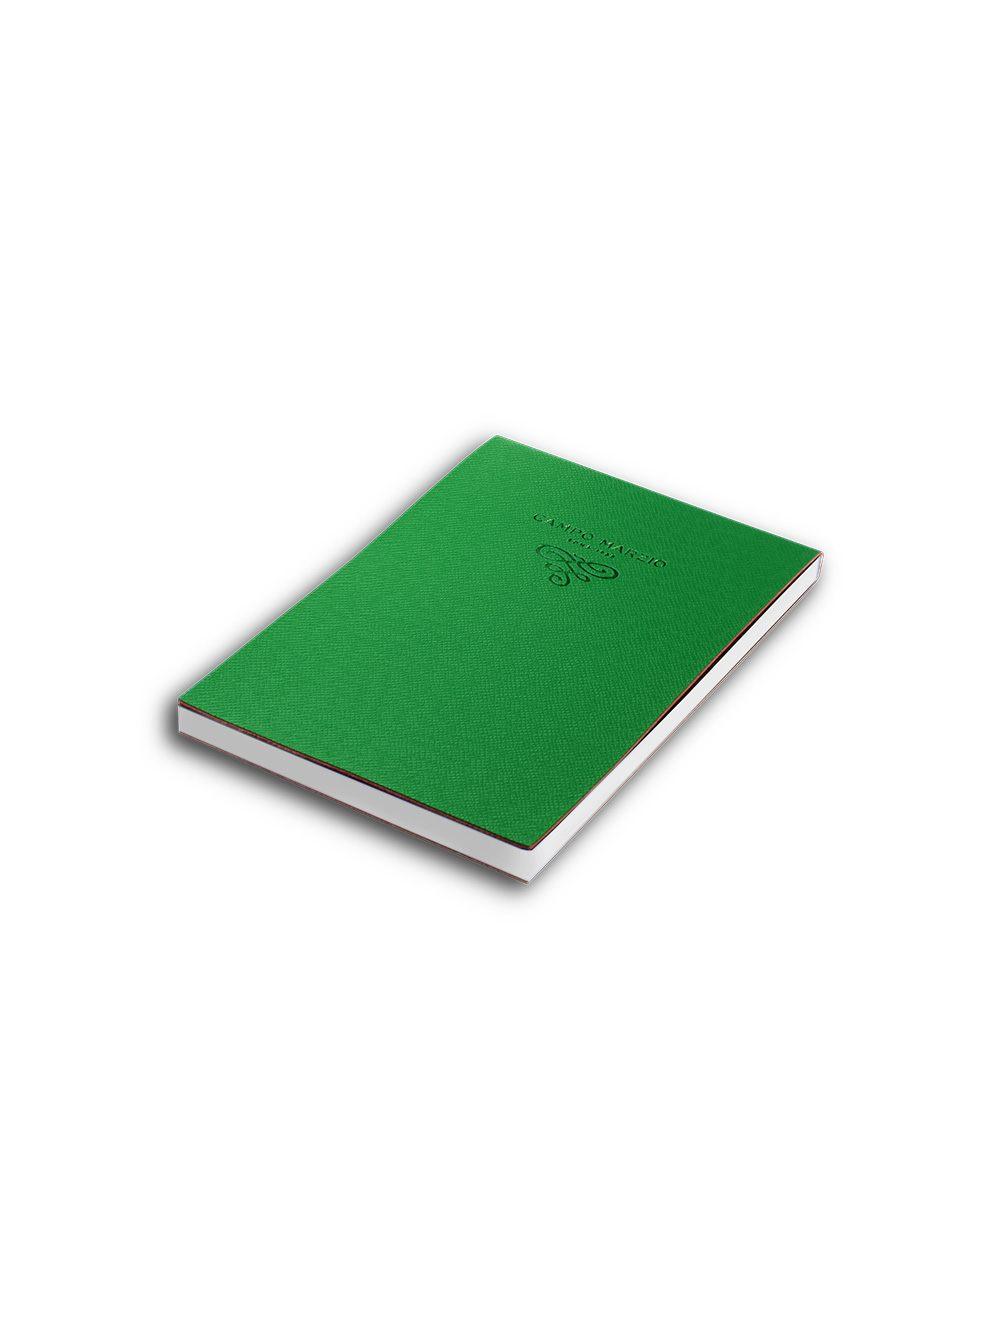 Notes 15 X 21 Cm Saffiano White Page - Pine